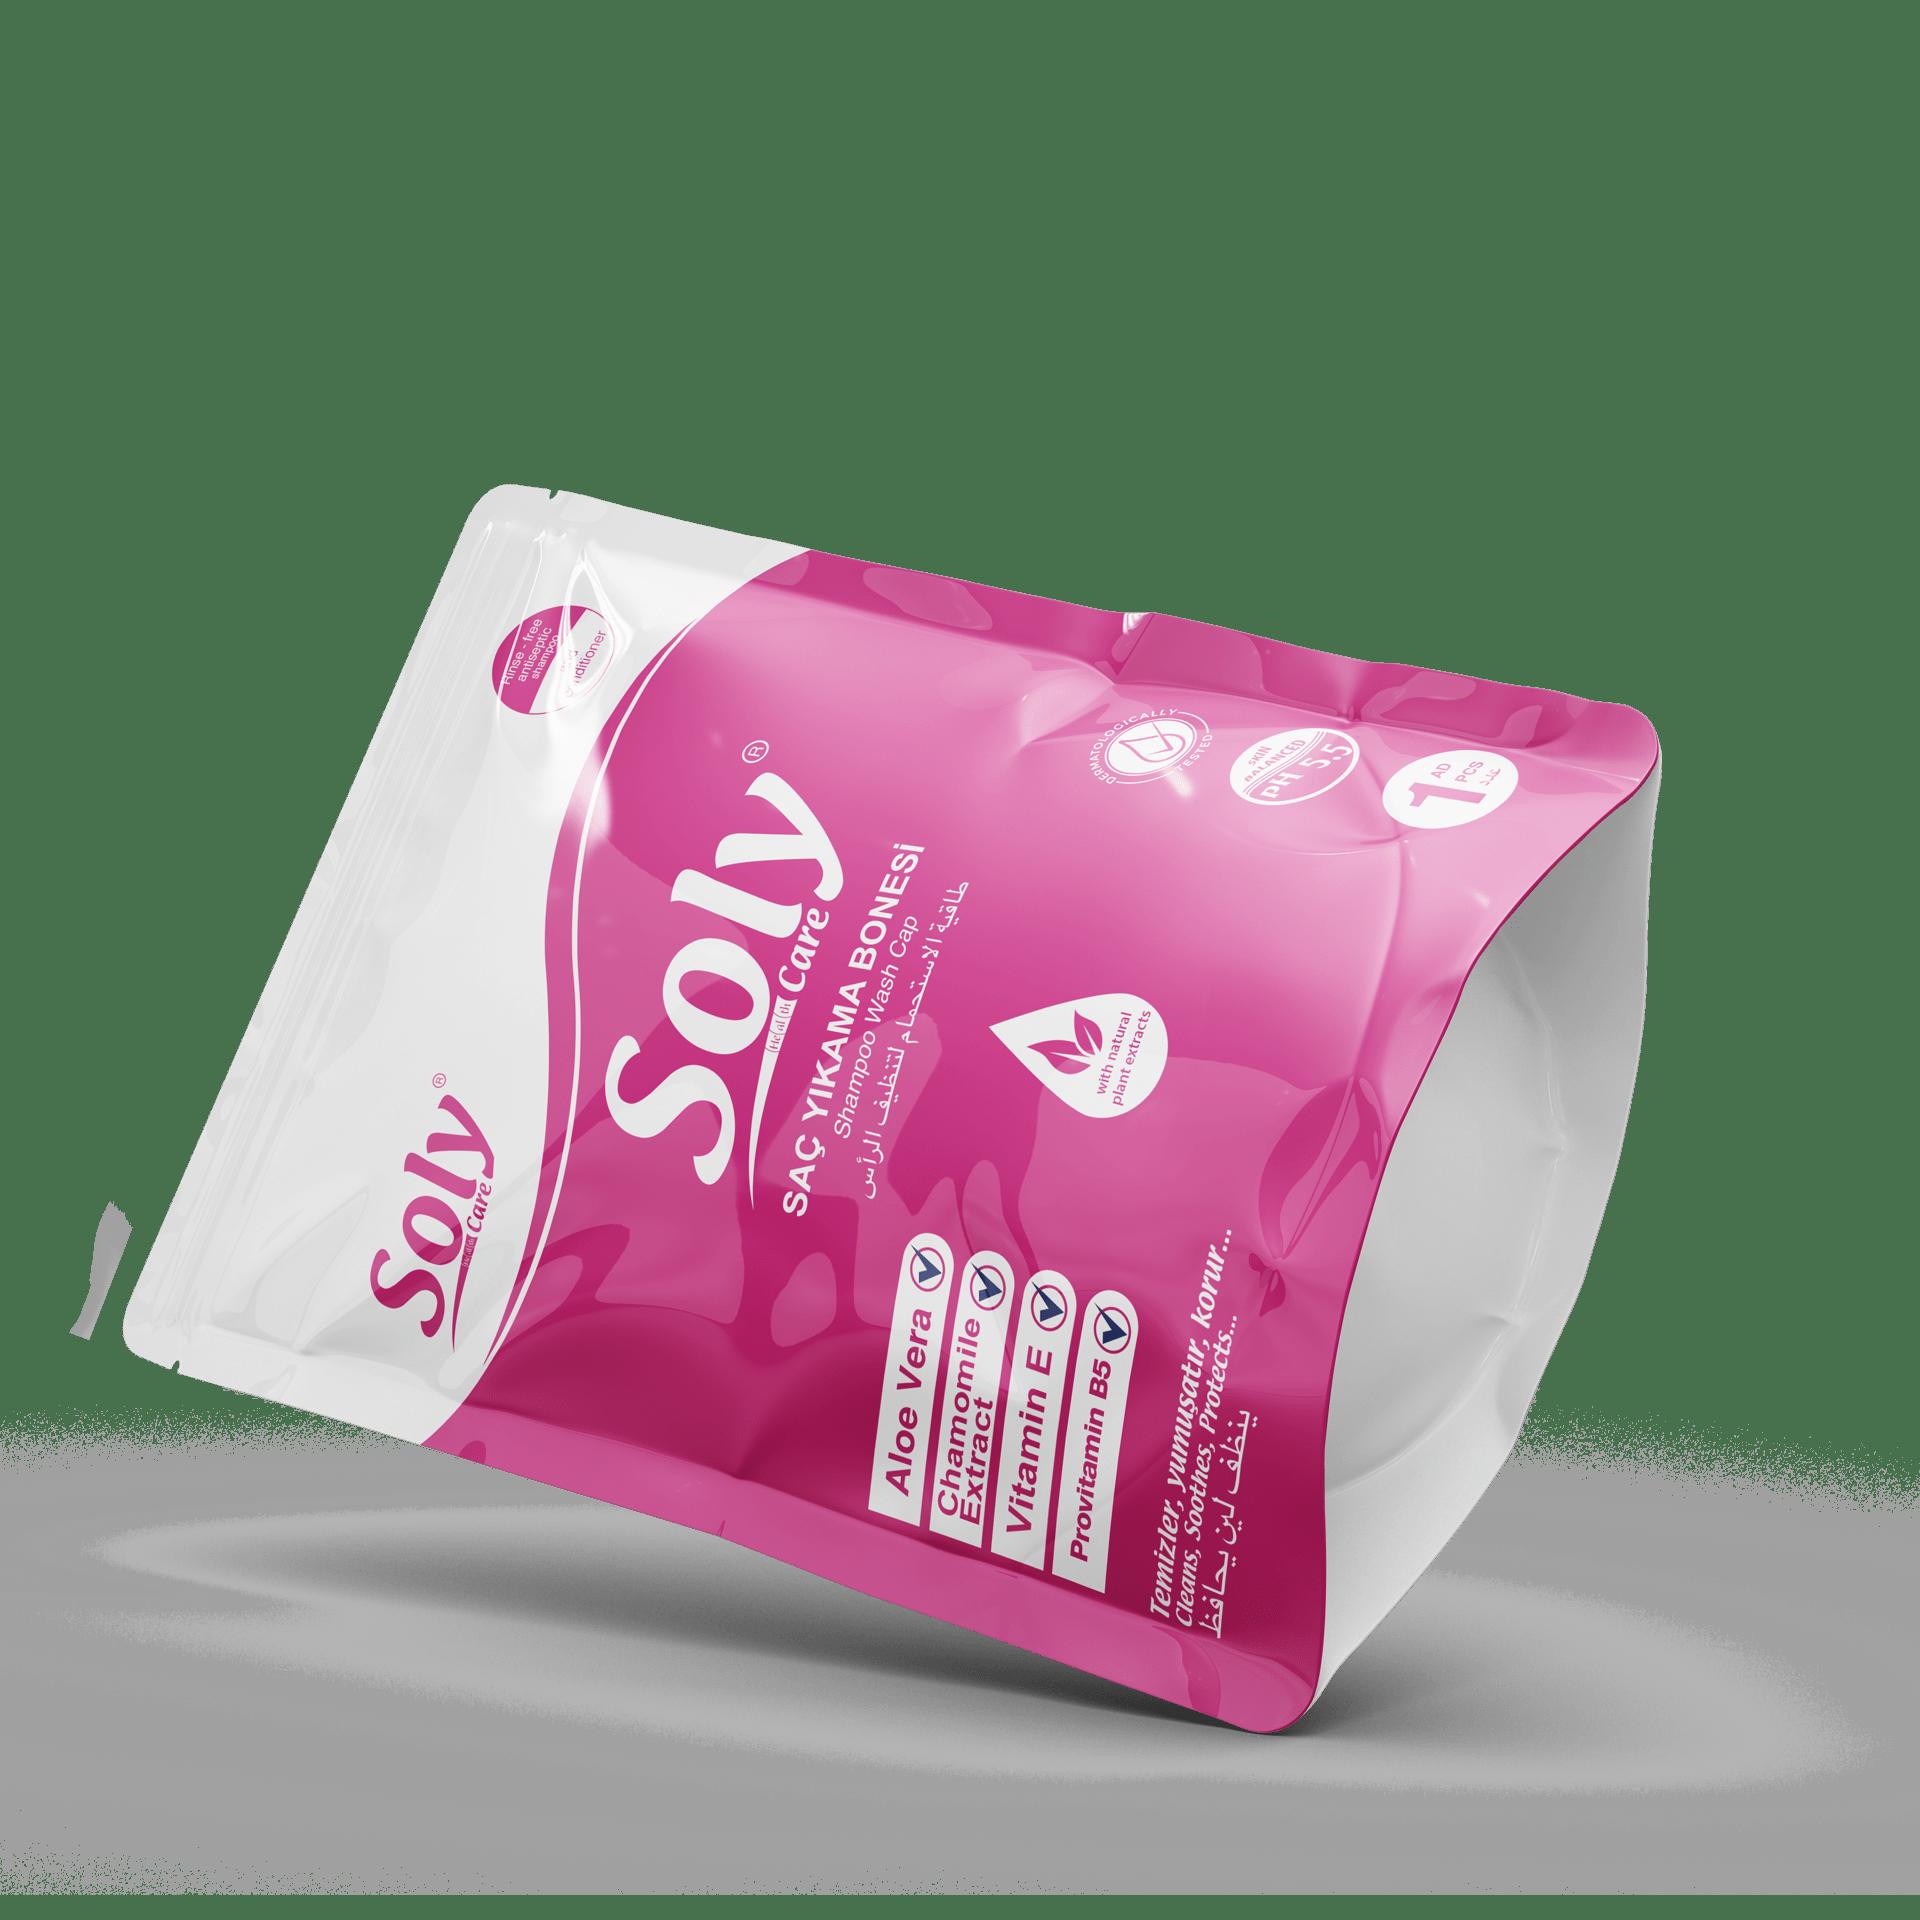 soly-care-sac-yikama-bonesi-shampoo-cap-yatay-min